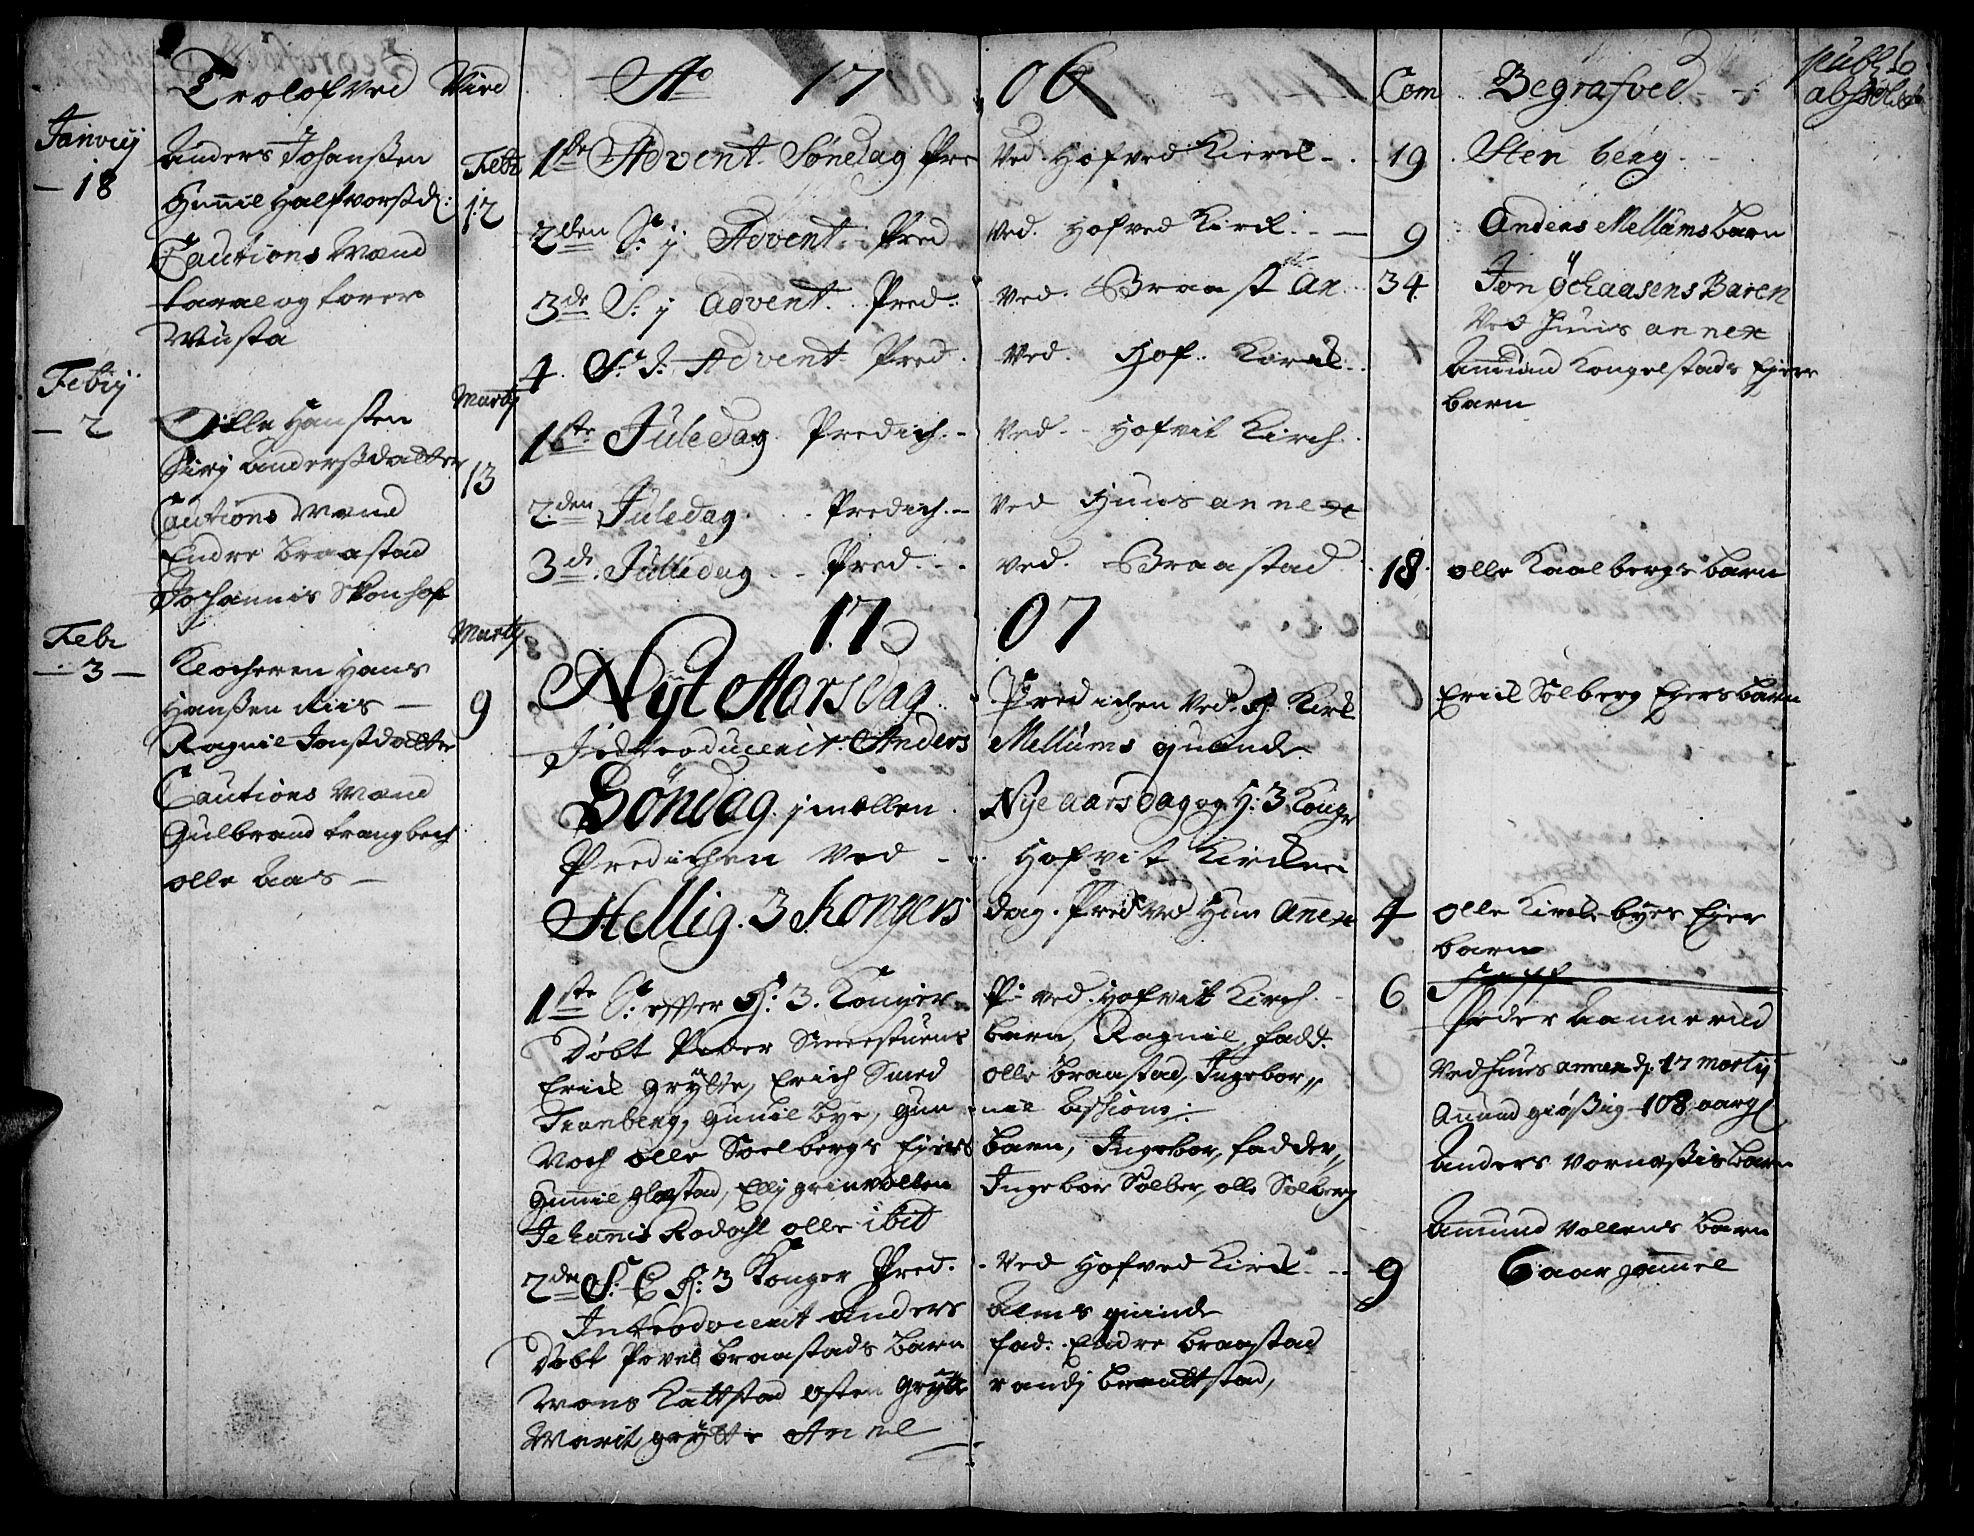 SAH, Vardal prestekontor, H/Ha/Haa/L0001: Ministerialbok nr. 1, 1706-1748, s. 6